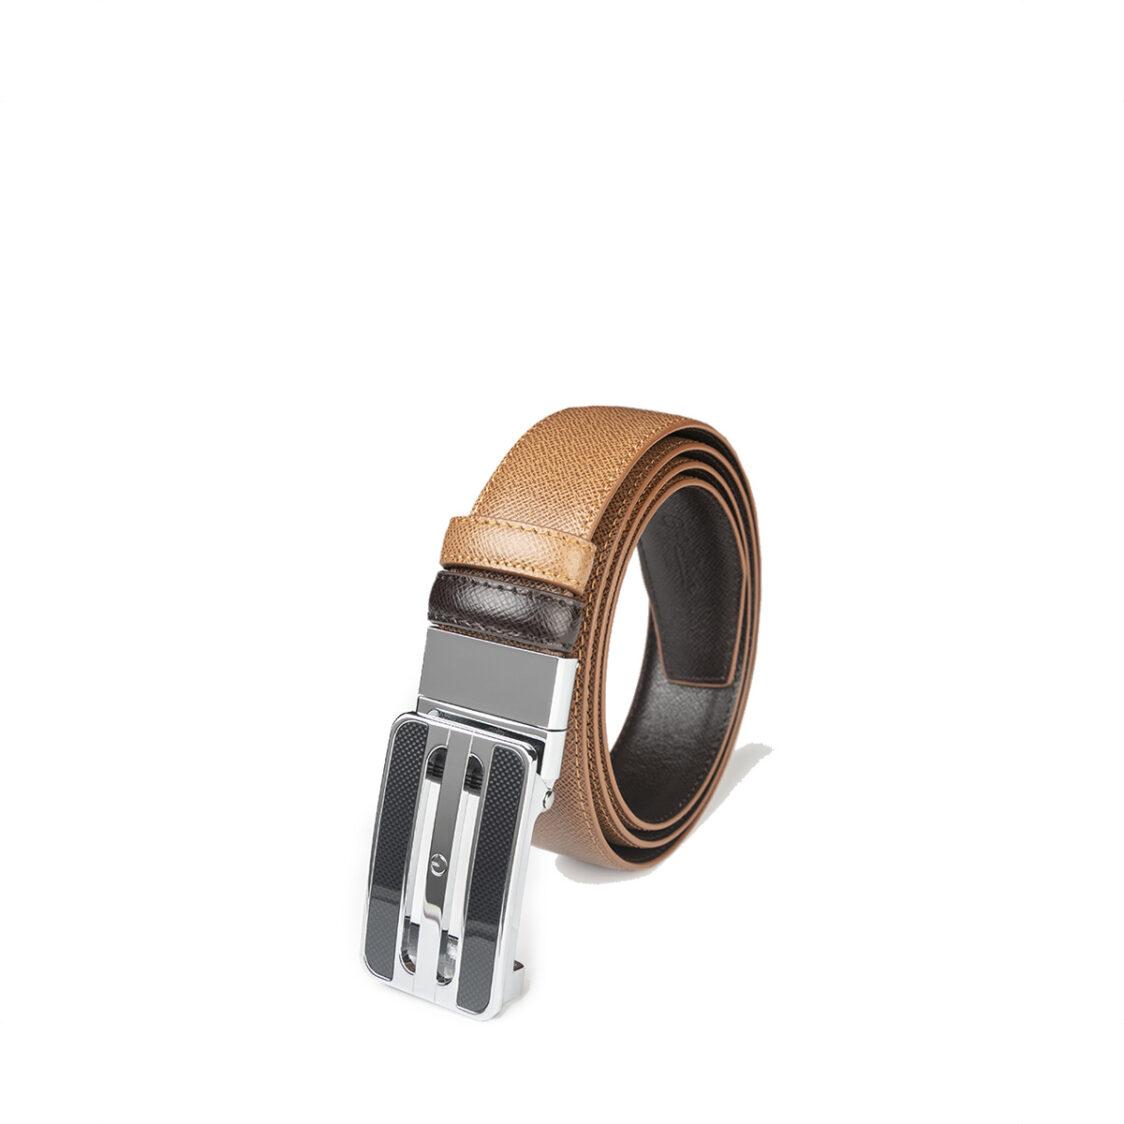 Goldlion 35mm Auto Reversible Belt